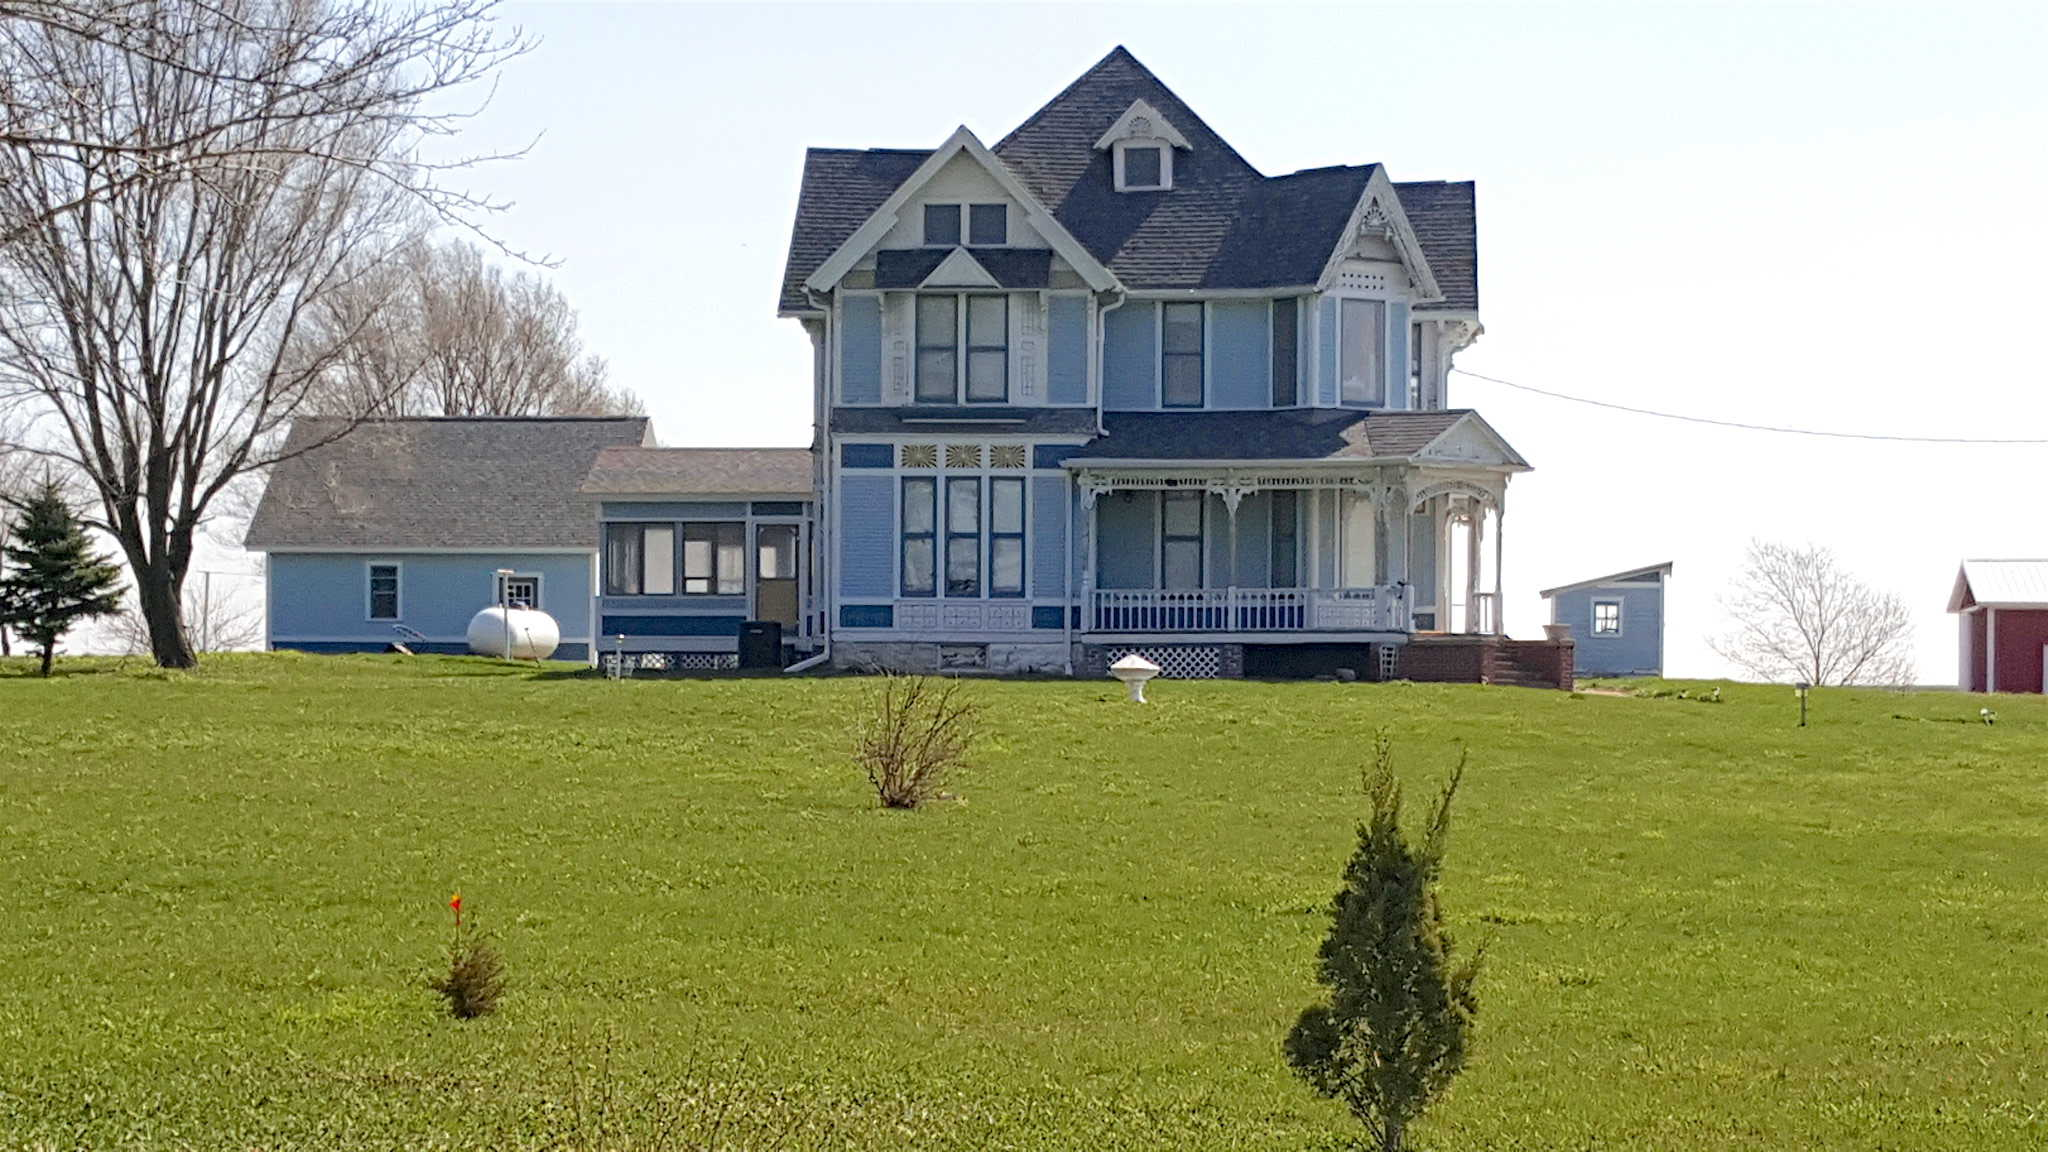 Twister Movie Site in Eldora, Iowa - BEST Places to Visit in Central East Iowa